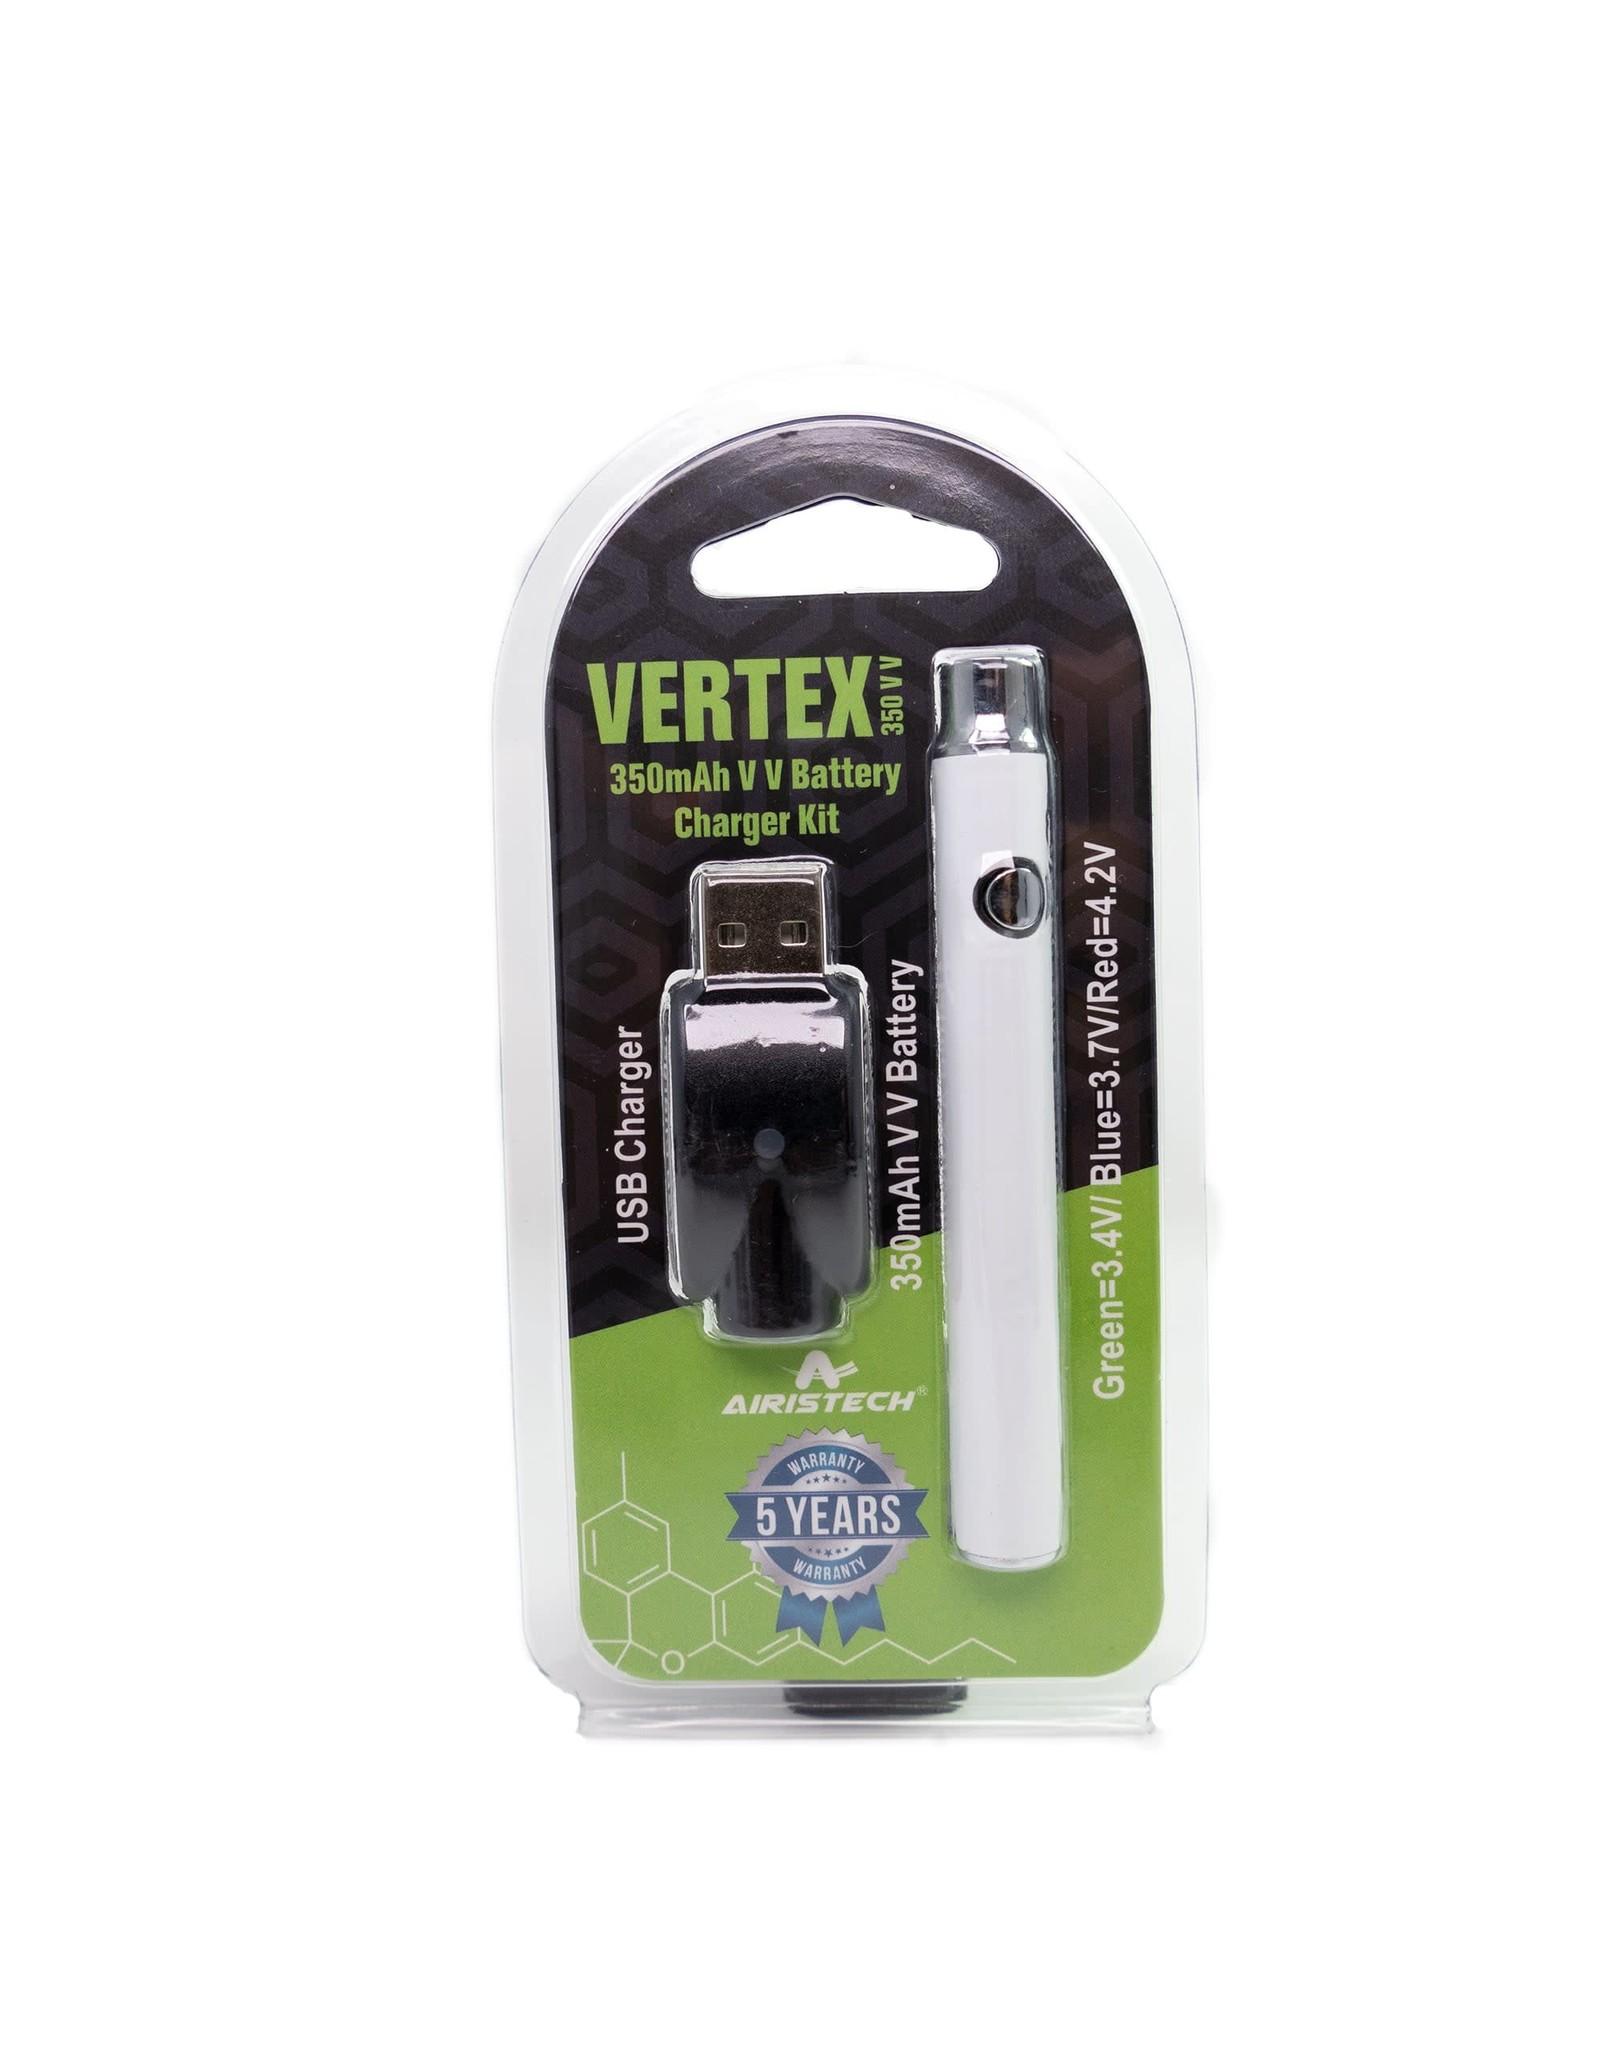 Apothecary Rx Vertex 350mAH Pen Battery